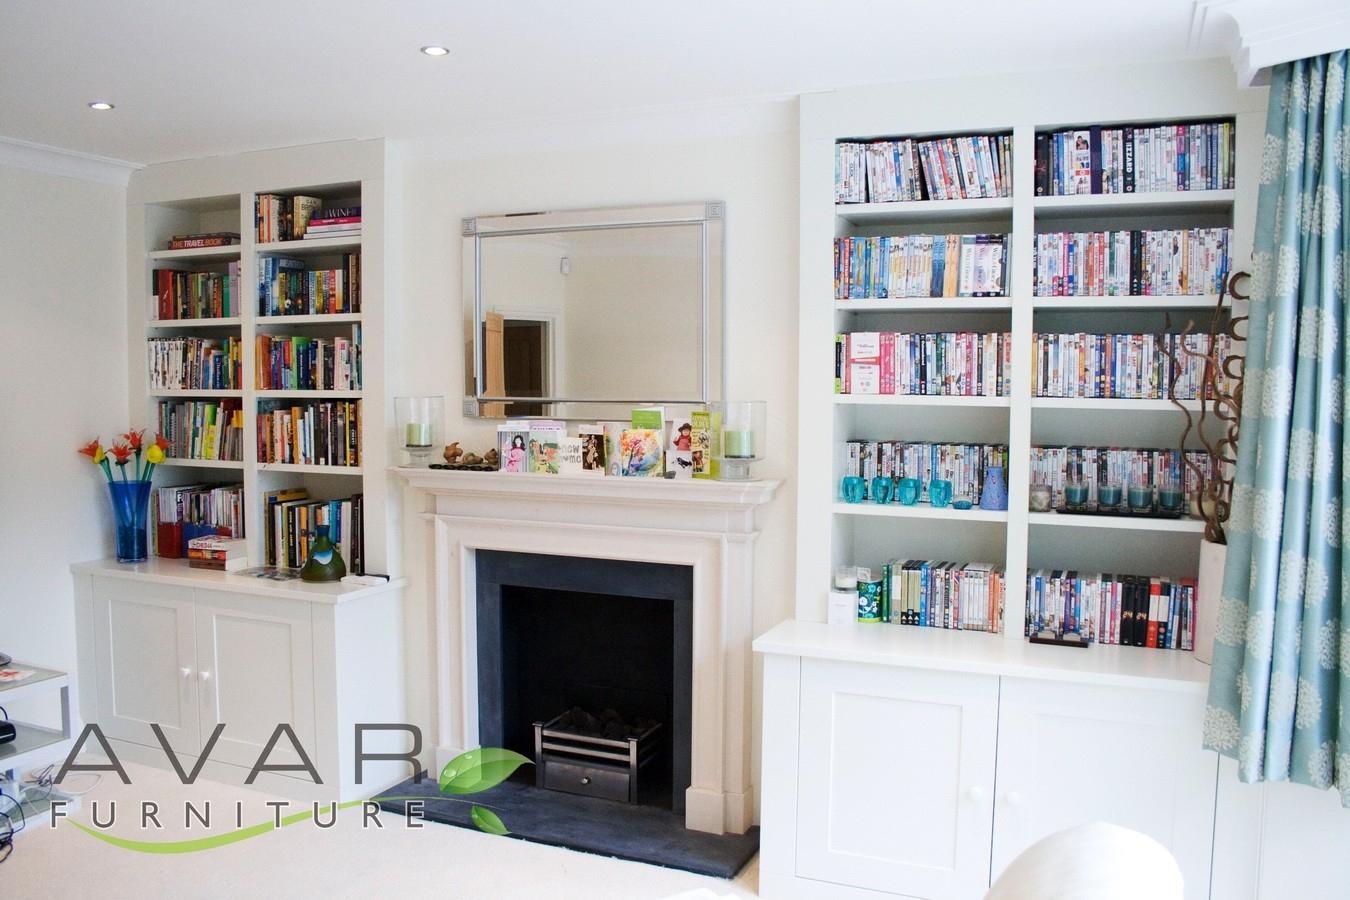 Bespoke Bookcase Beautiful Home Design Simple On Bespoke Bookcase With Bespoke Bookcases (#4 of 15)